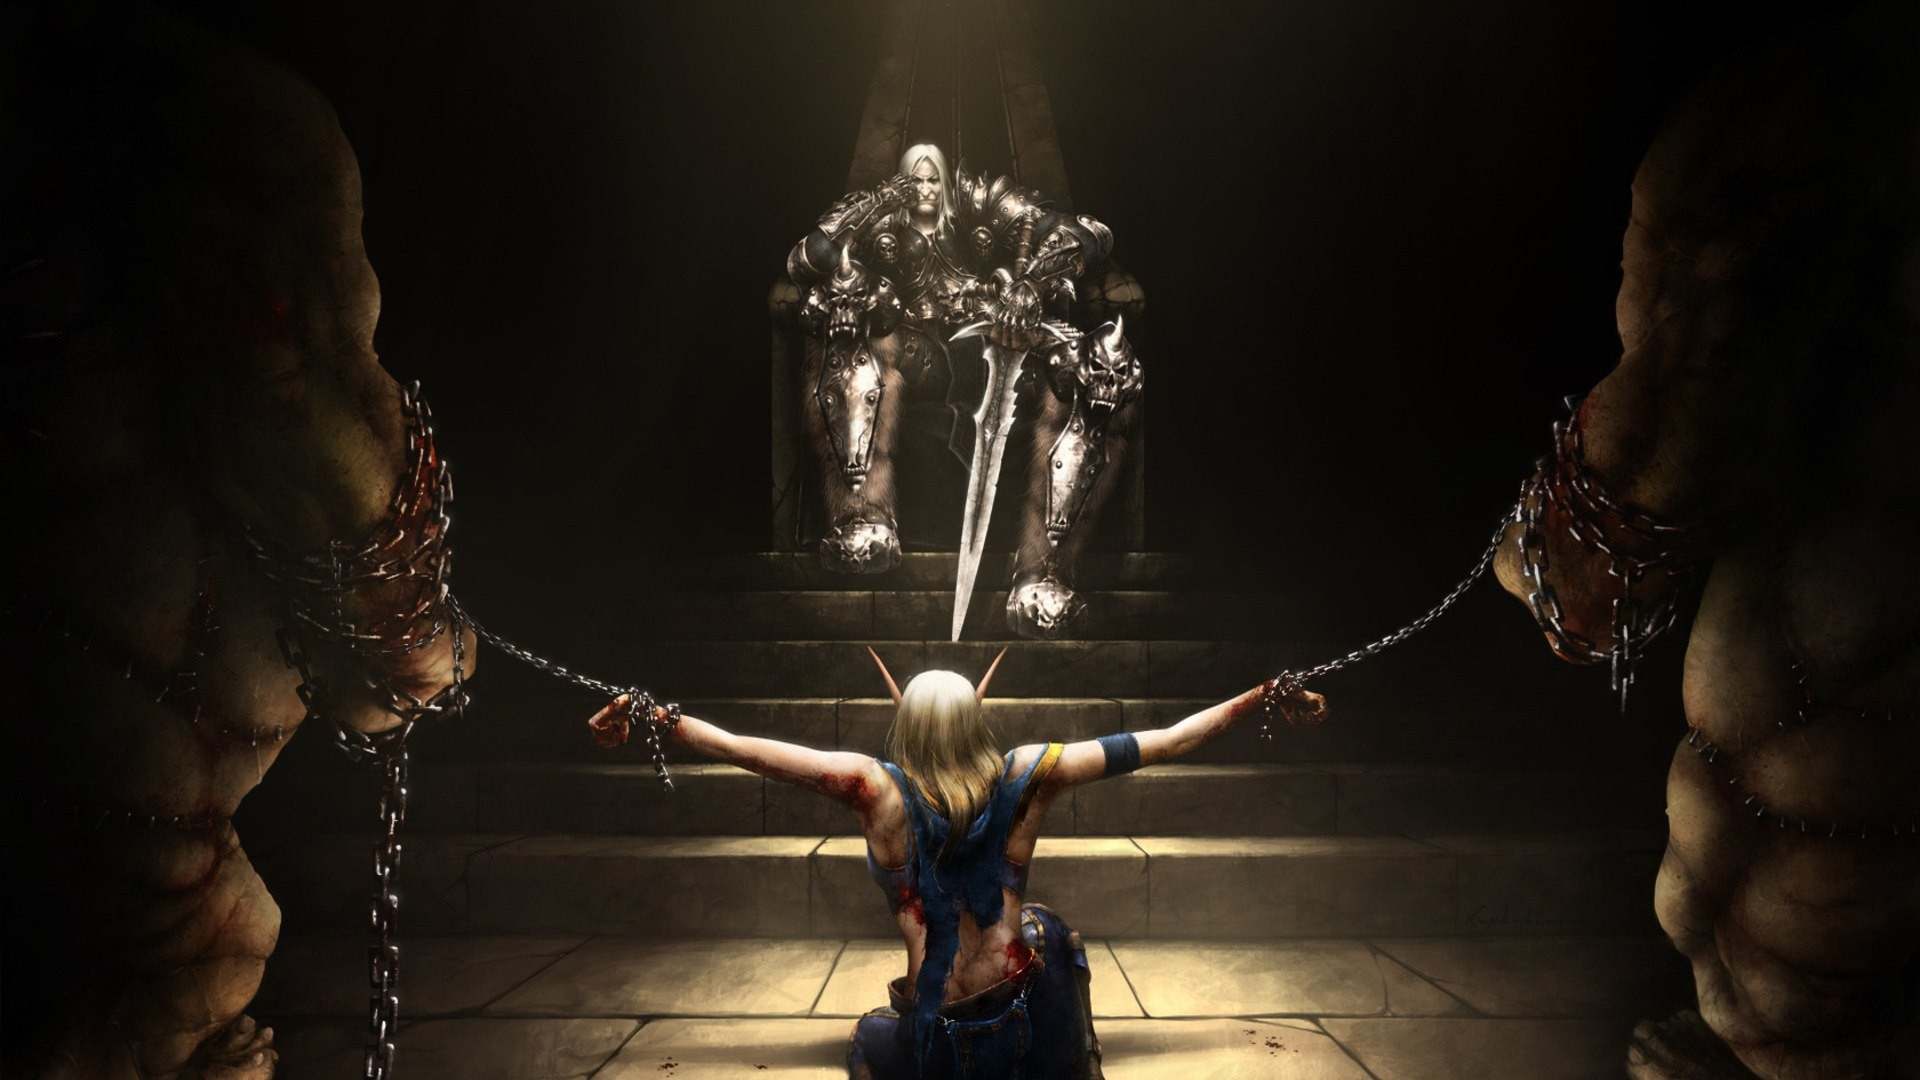 Warcraft · download Warcraft image · 46 Fav Sylvanas Windrunner